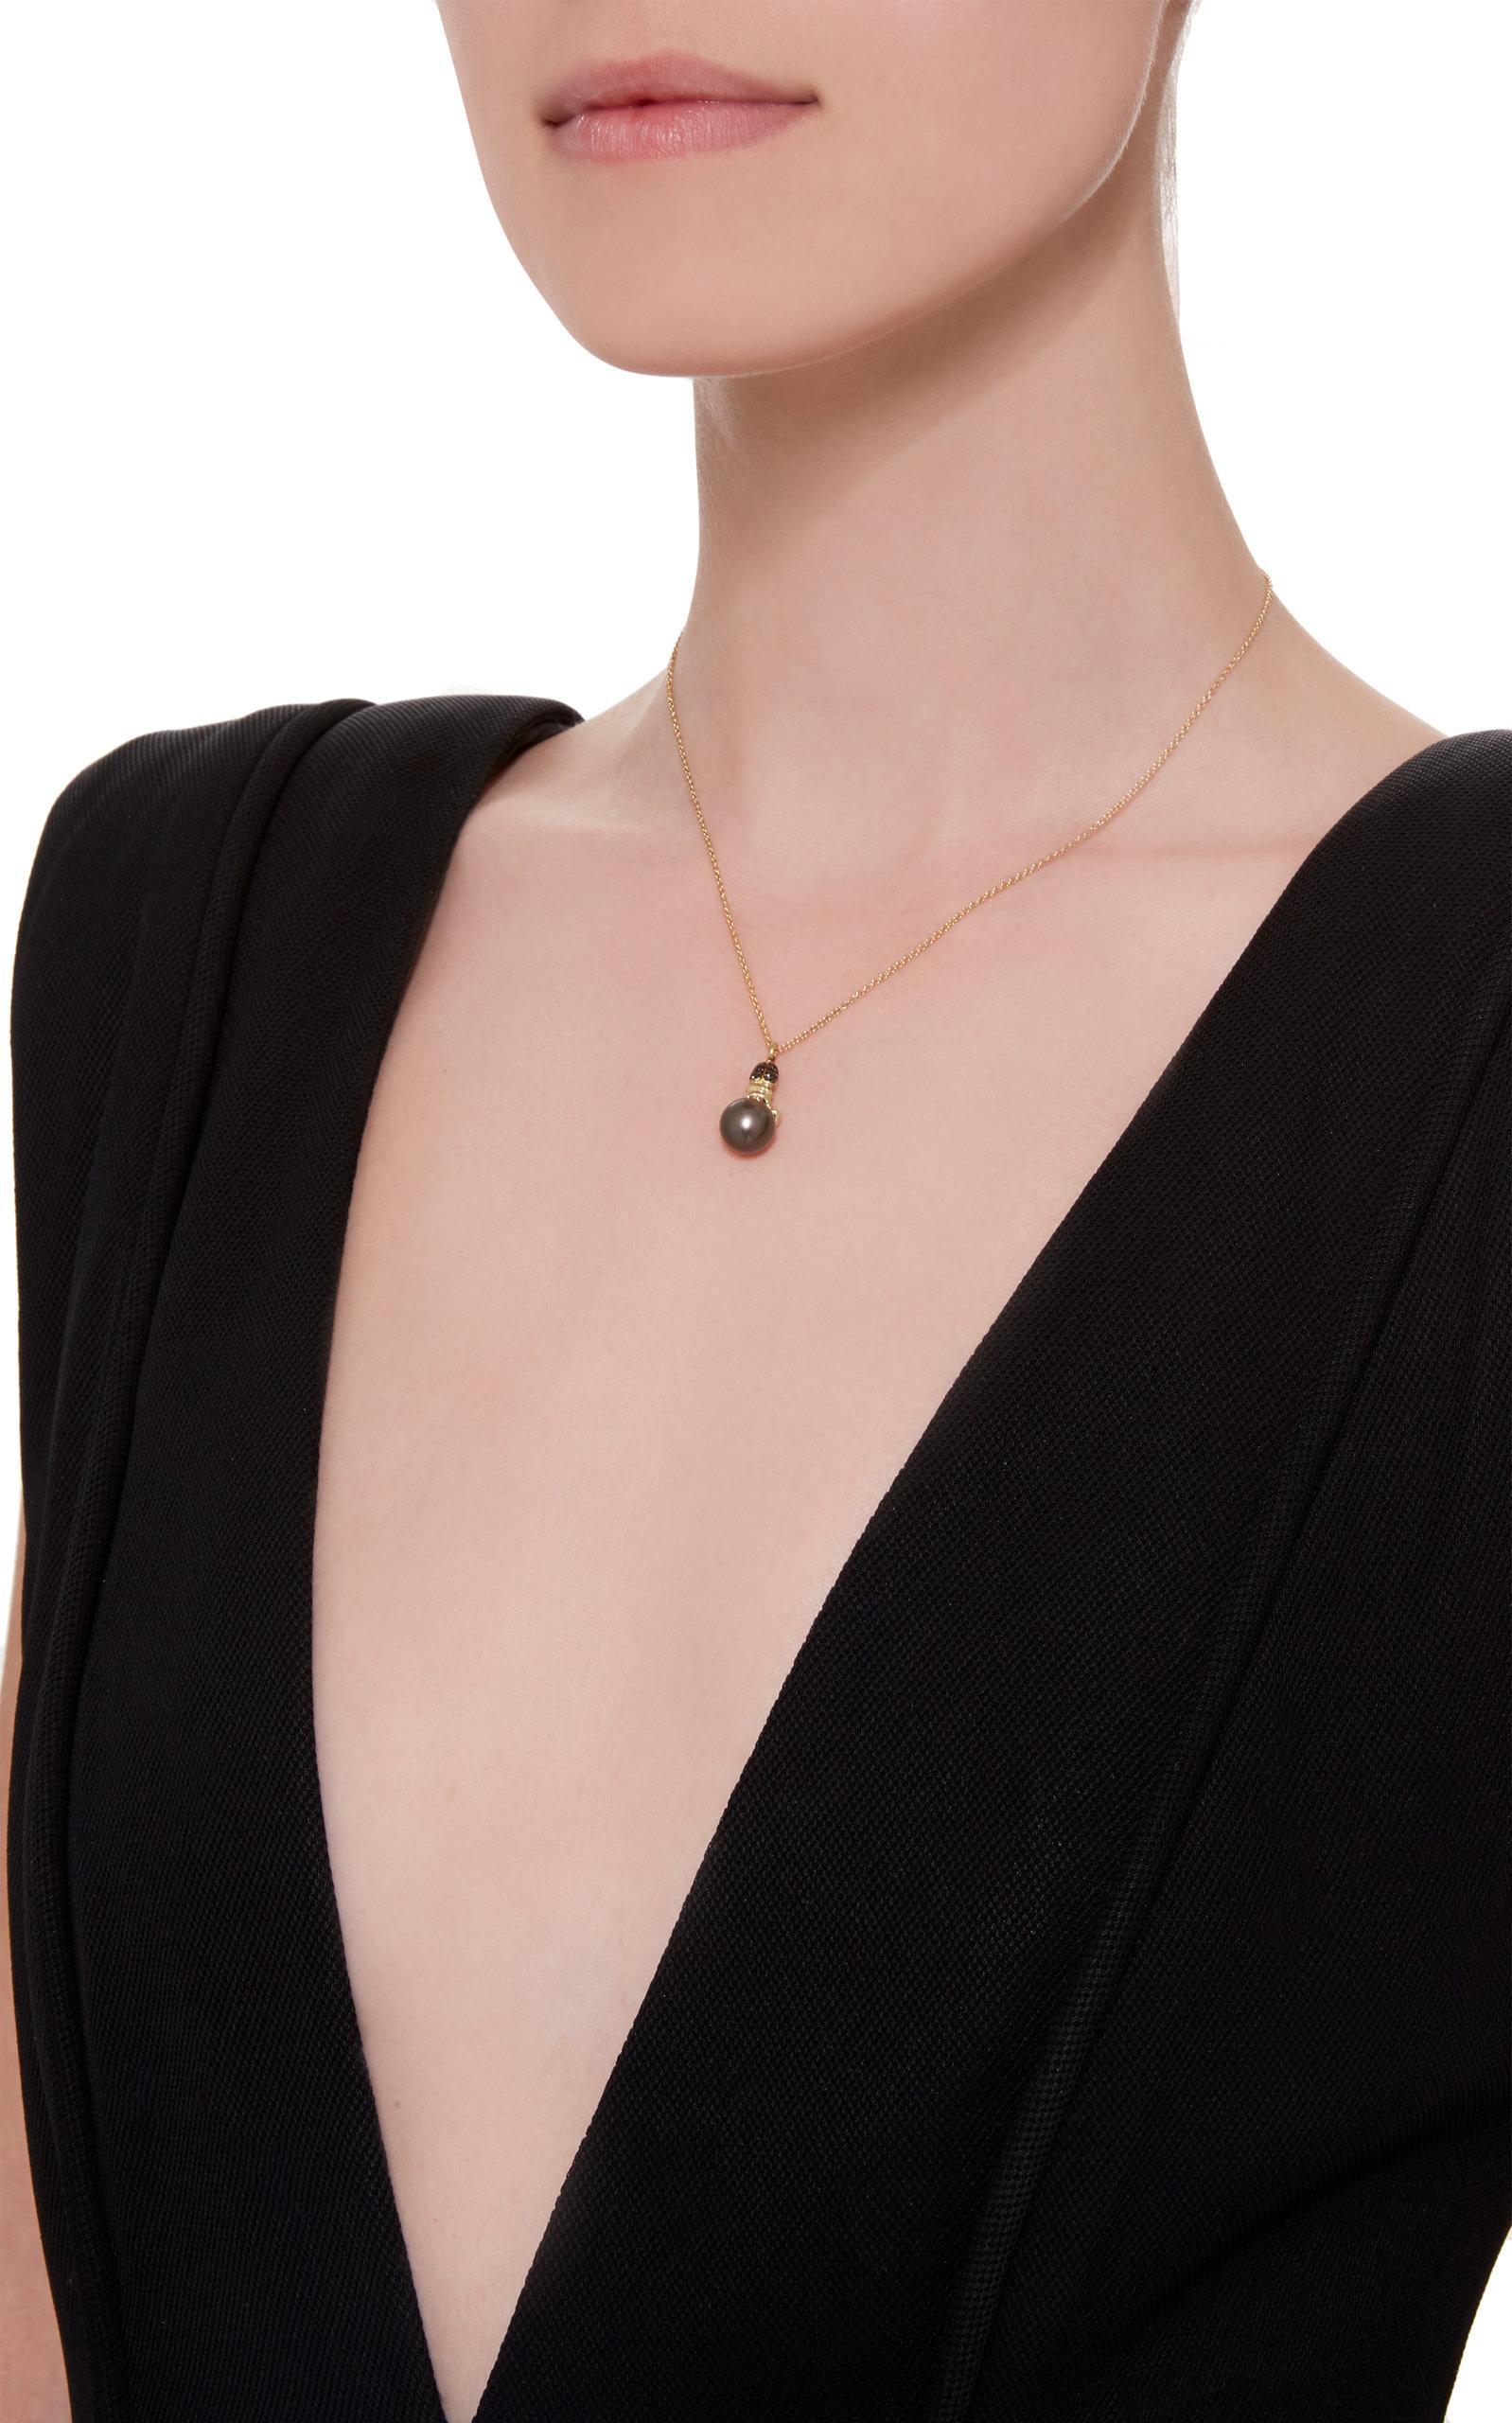 Daniela Villegas Khepri 18k Rose Gold, Garnet And Pearl Necklace in Black